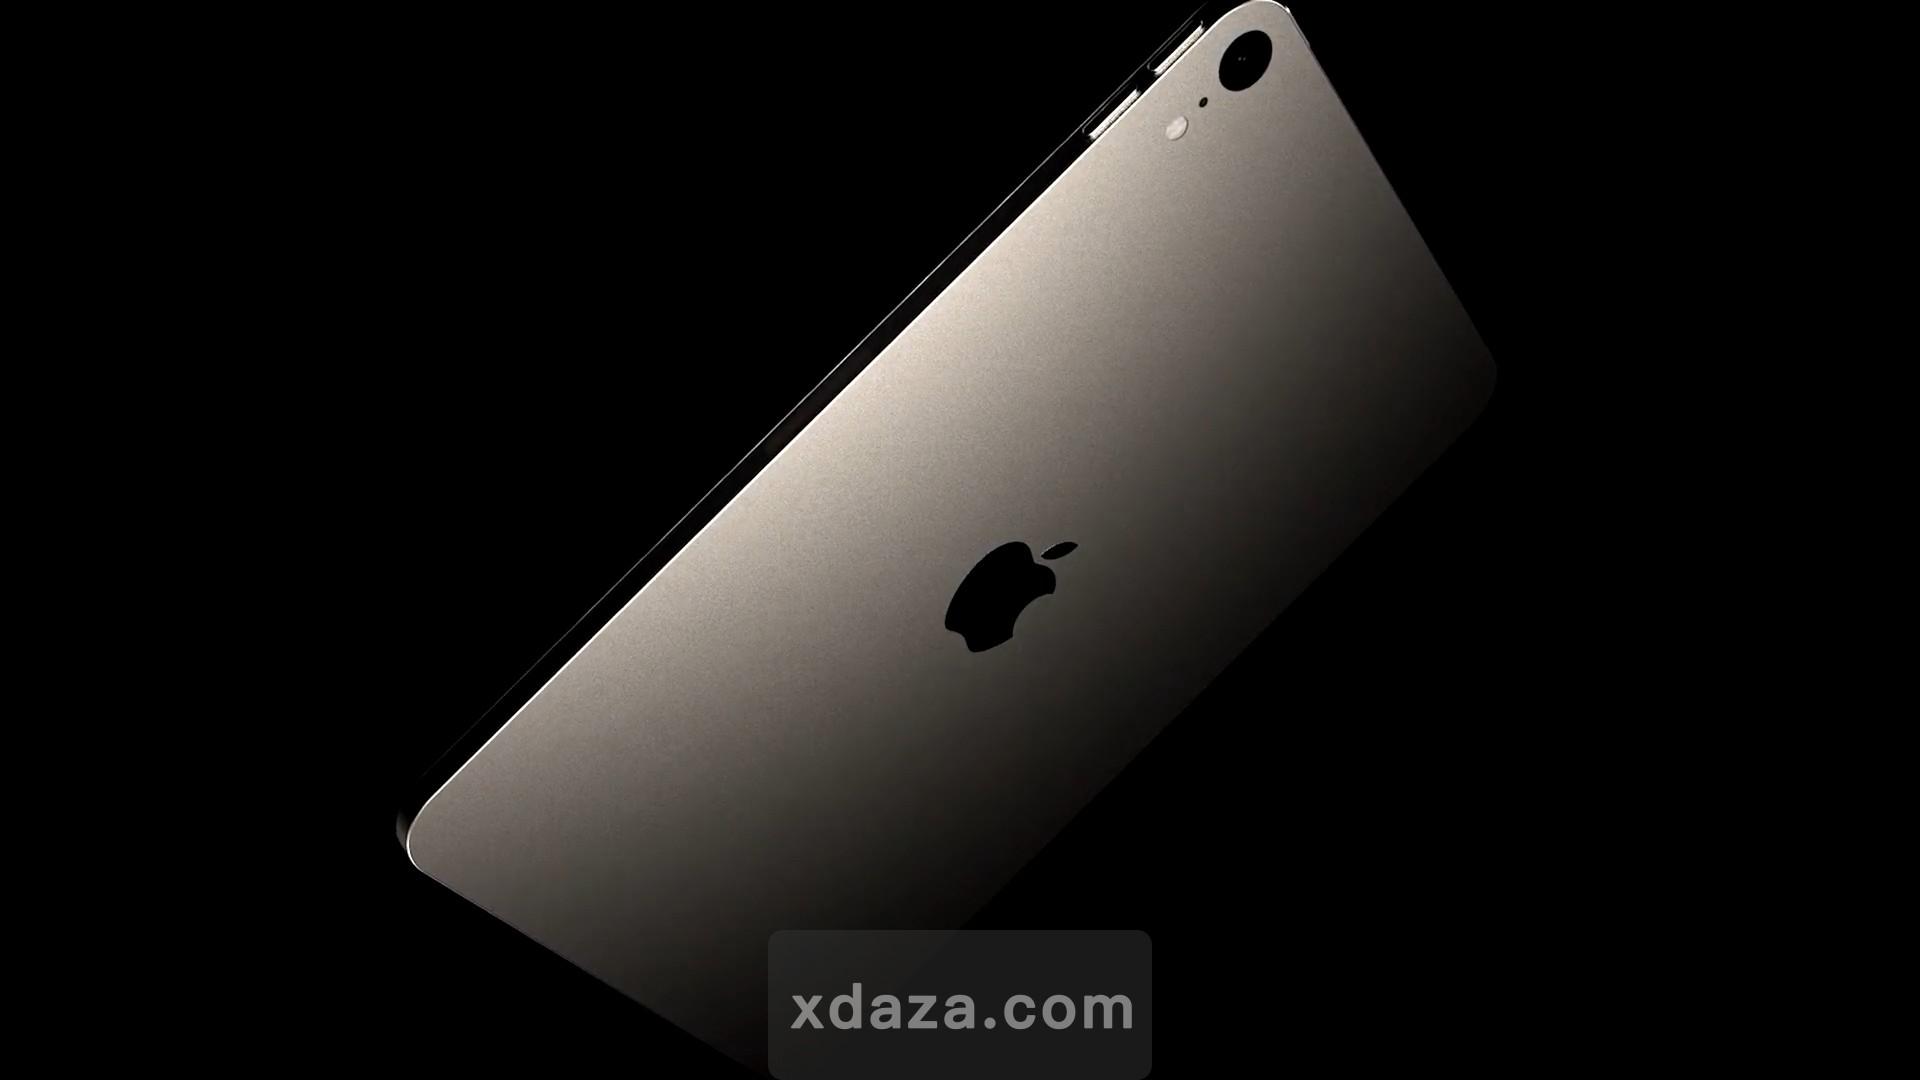 iPad mini 6四大特性曝光:有可能是苹果最有诚意的产品